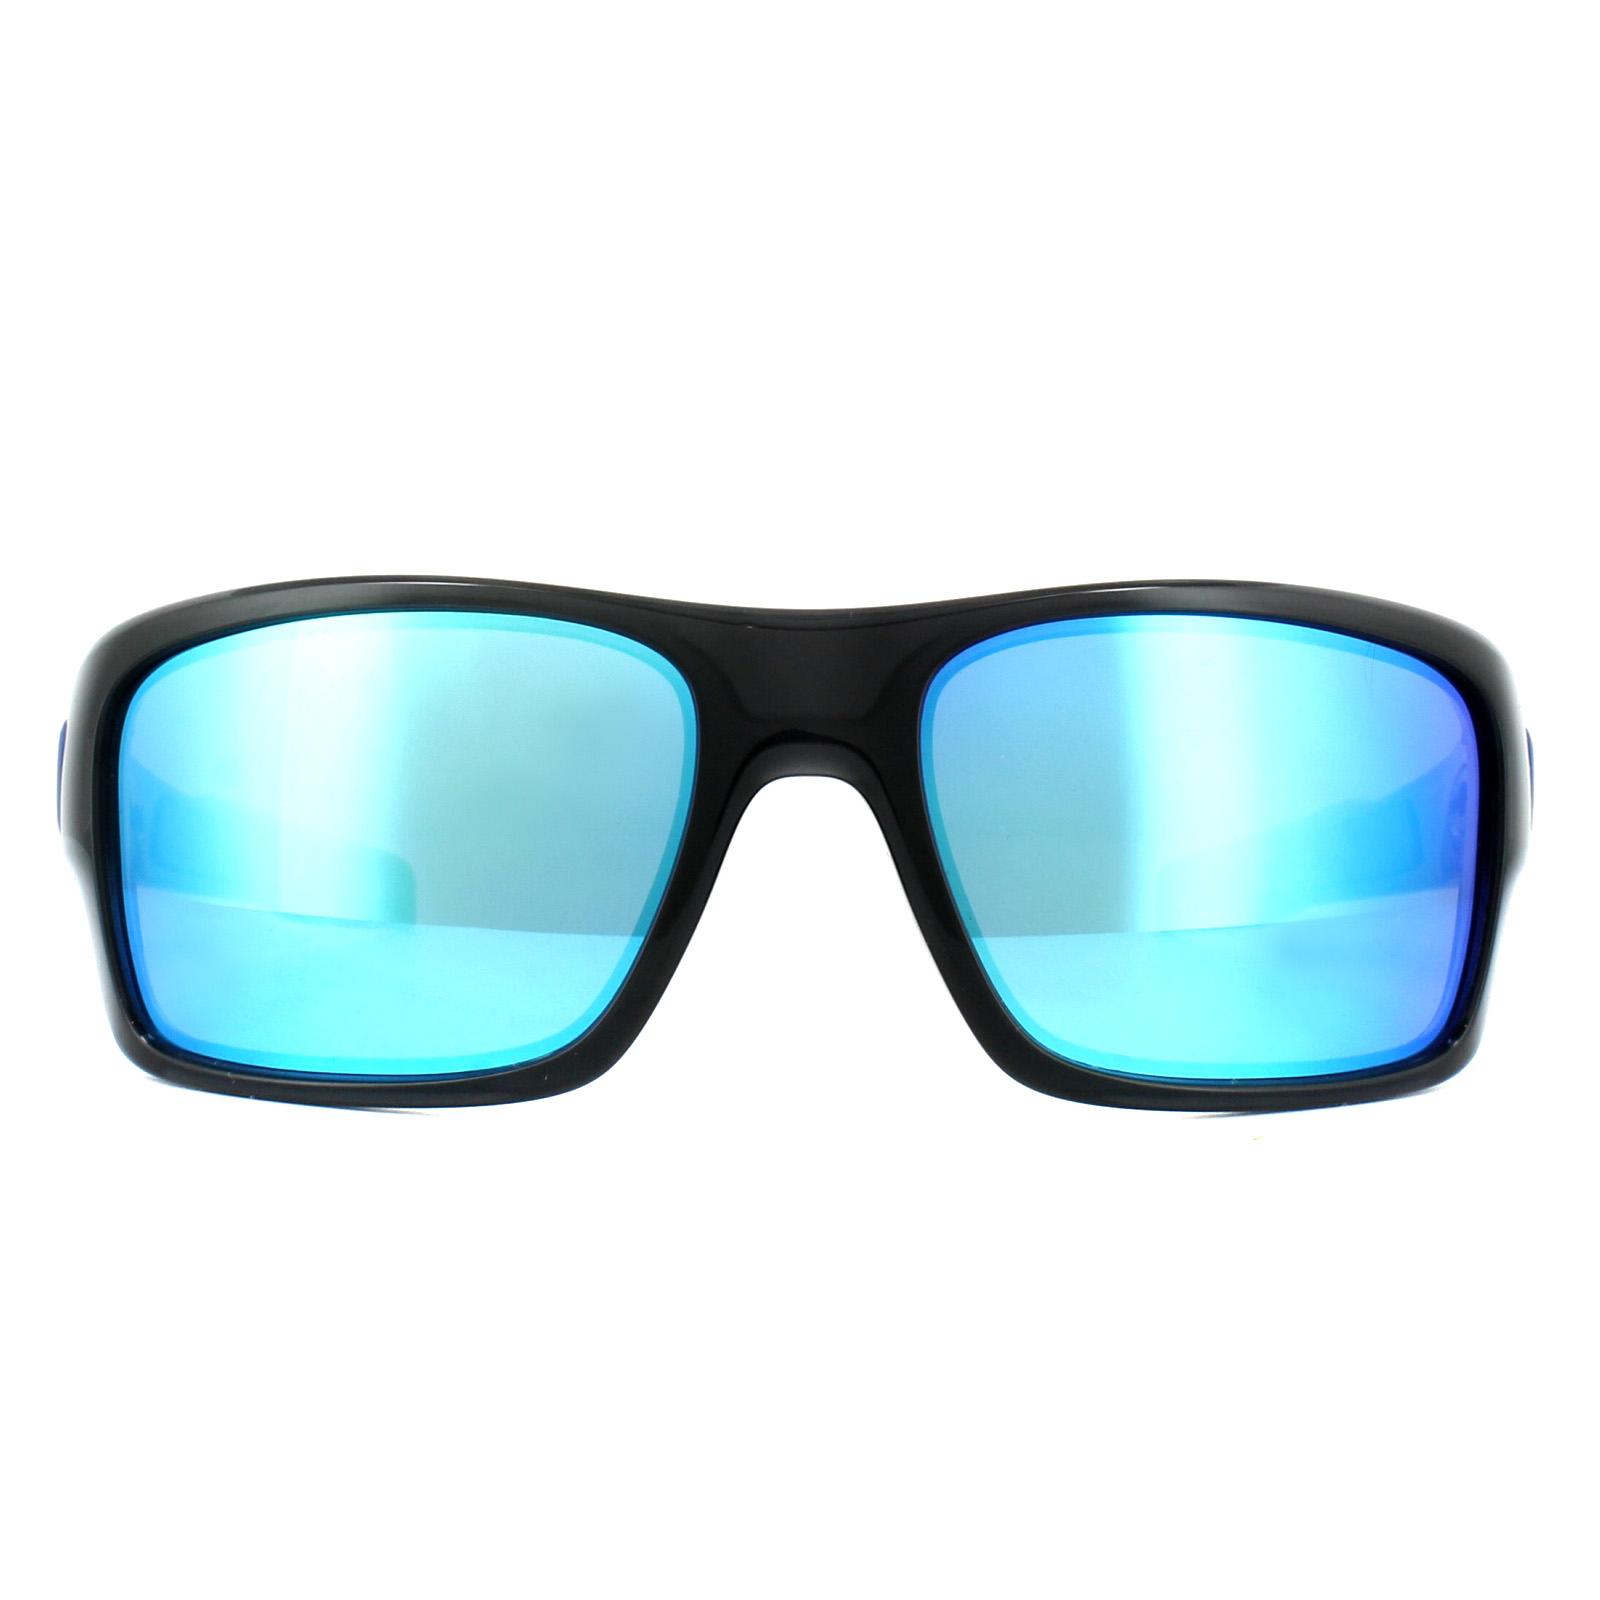 8566616ab2 Details about Oakley Sunglasses Turbine XS Youth Fit OJ9003-03 Black Ink  Sapphire Iridium